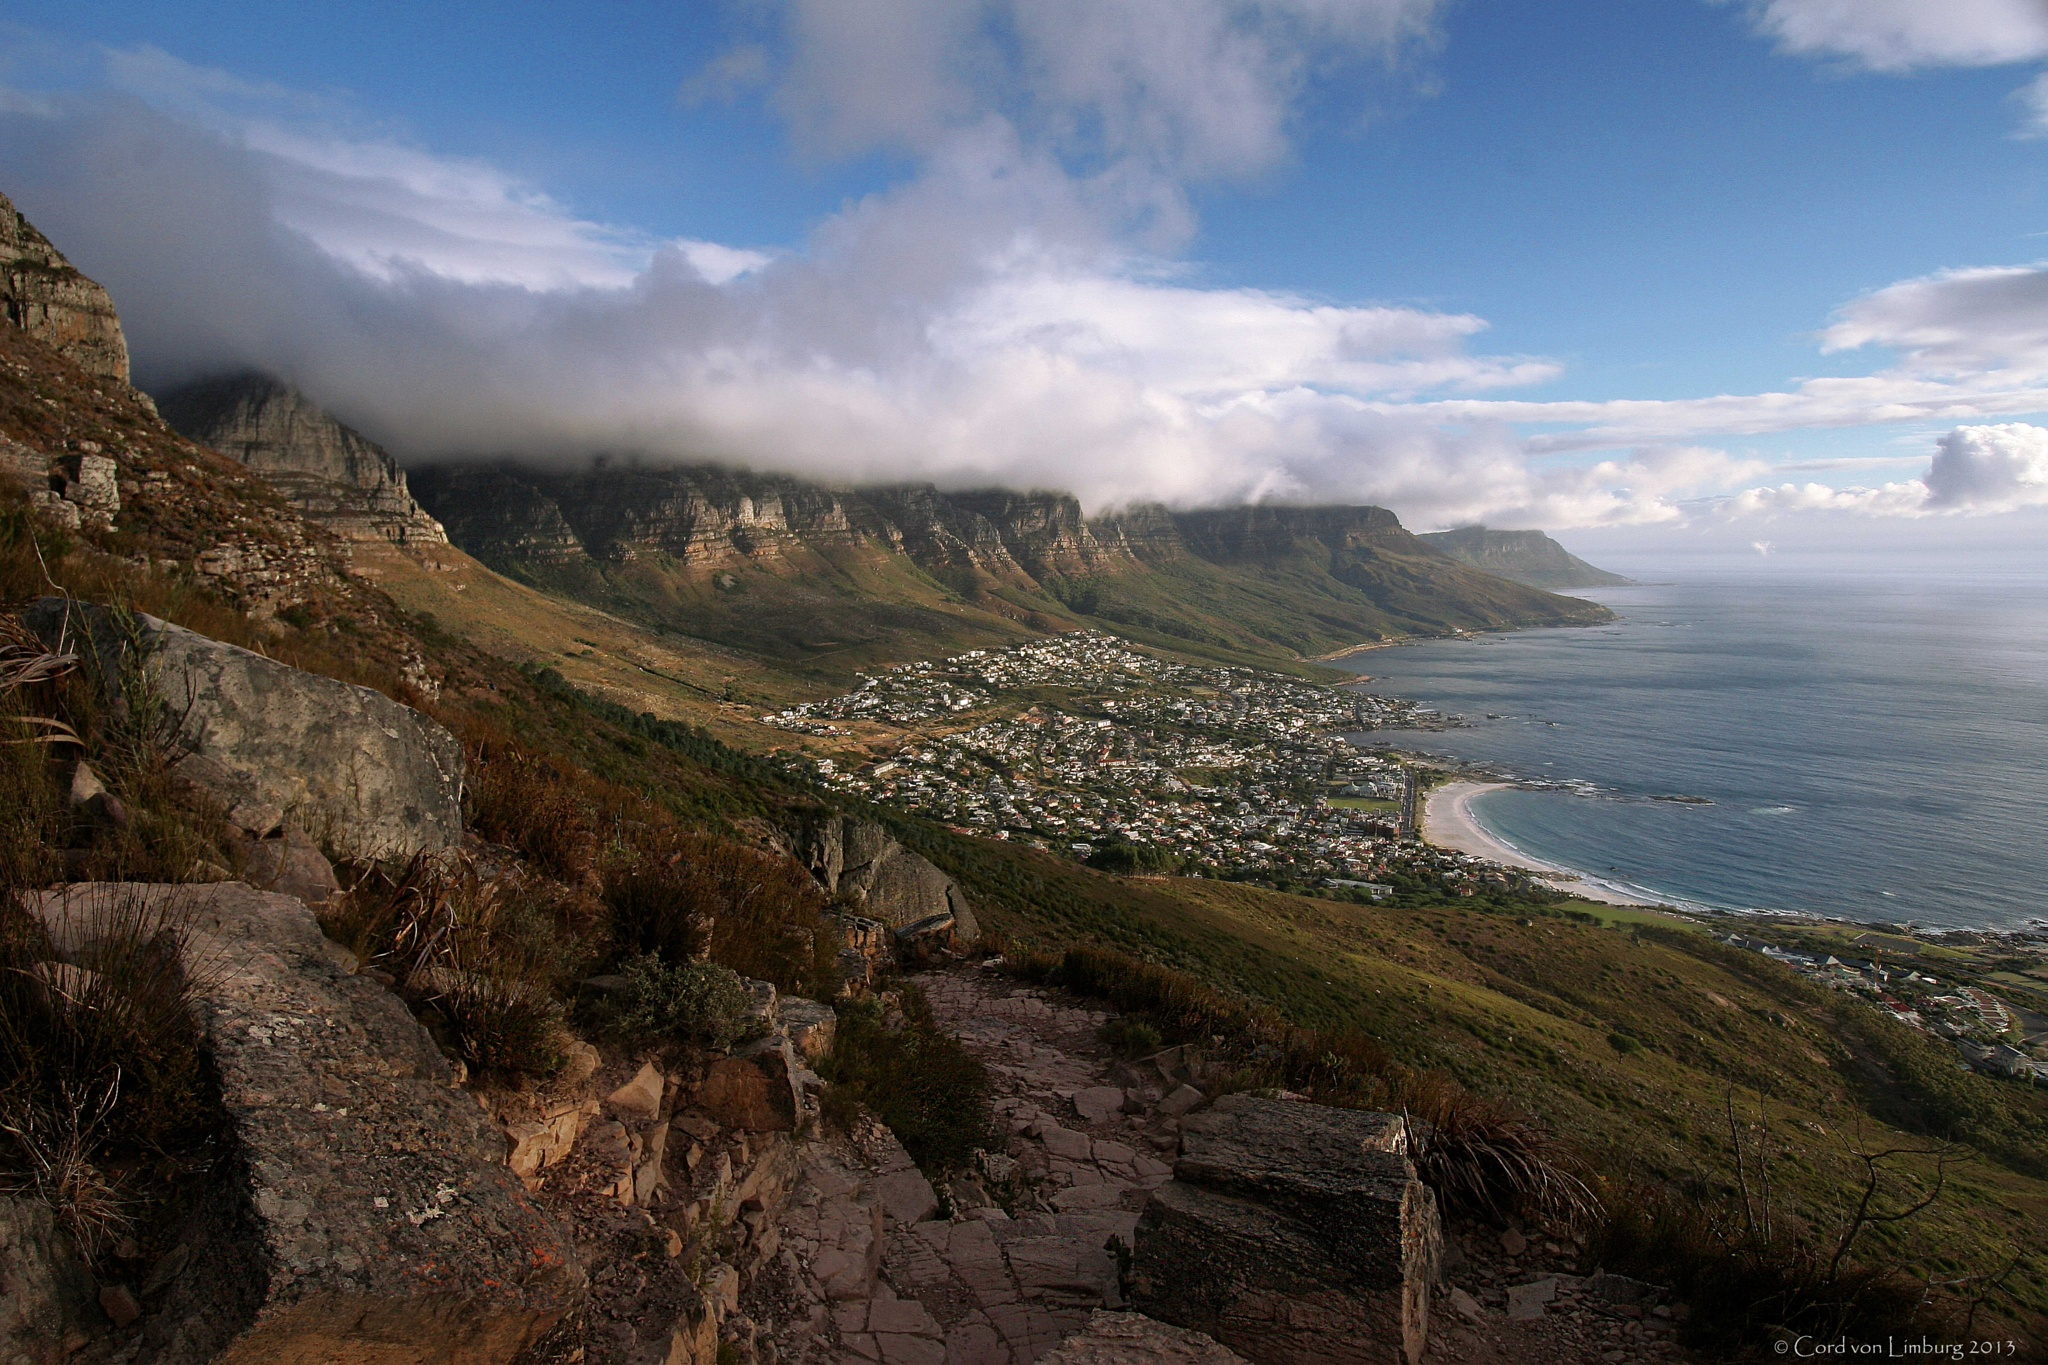 Twelve Apostle (backside of Table Mountain) by Cord von Limburg